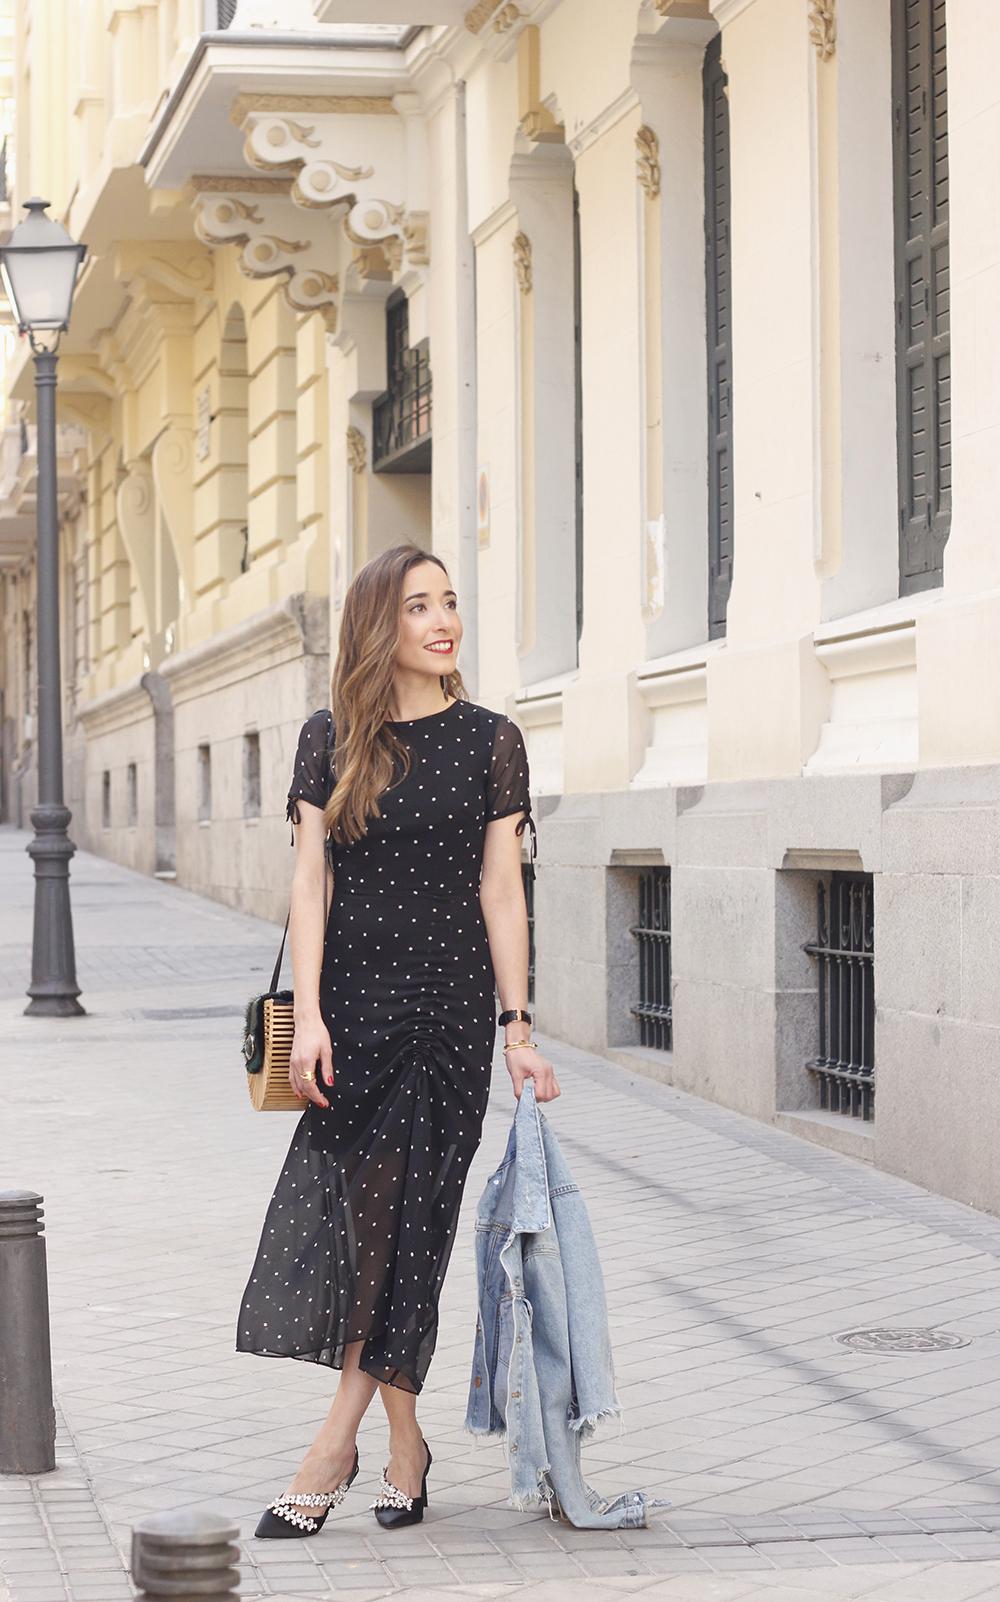 polka dot dress uterqüe jewel heels denim jacket outfit street style bamboo bag02